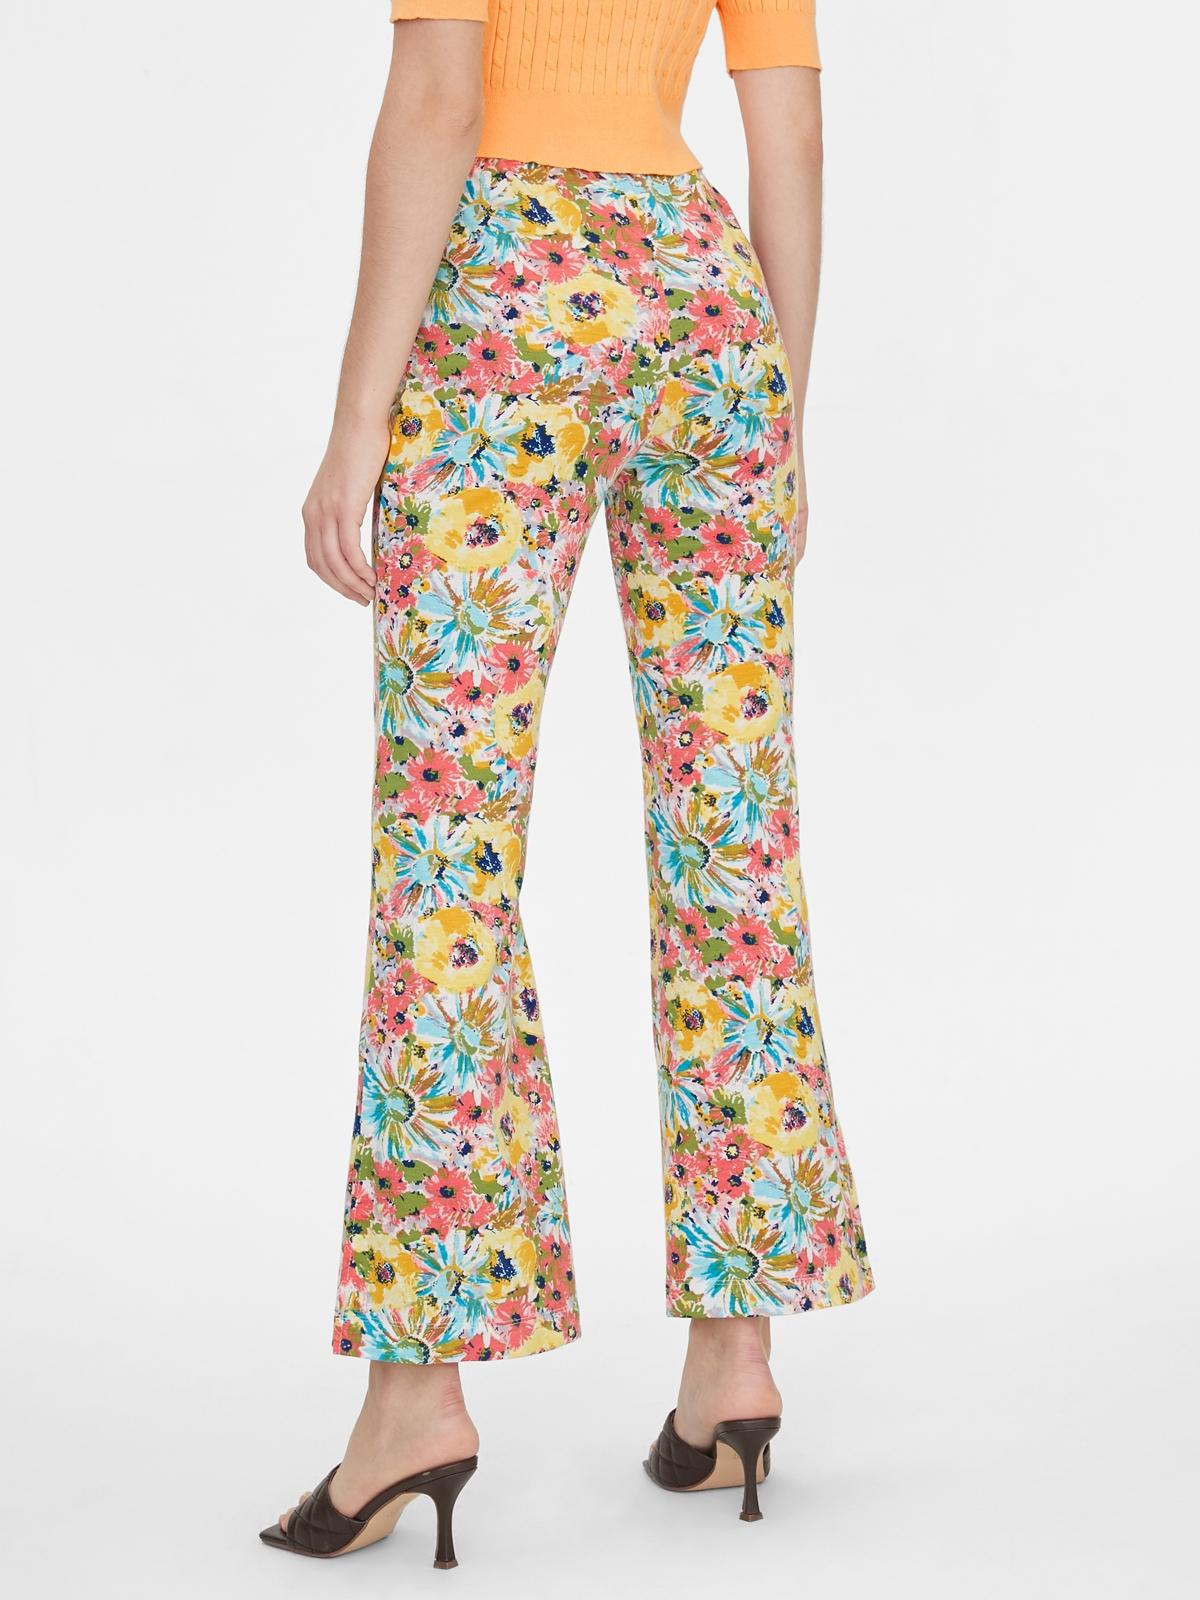 Matter Makers 120Flower Print Jersey Pants Yellow